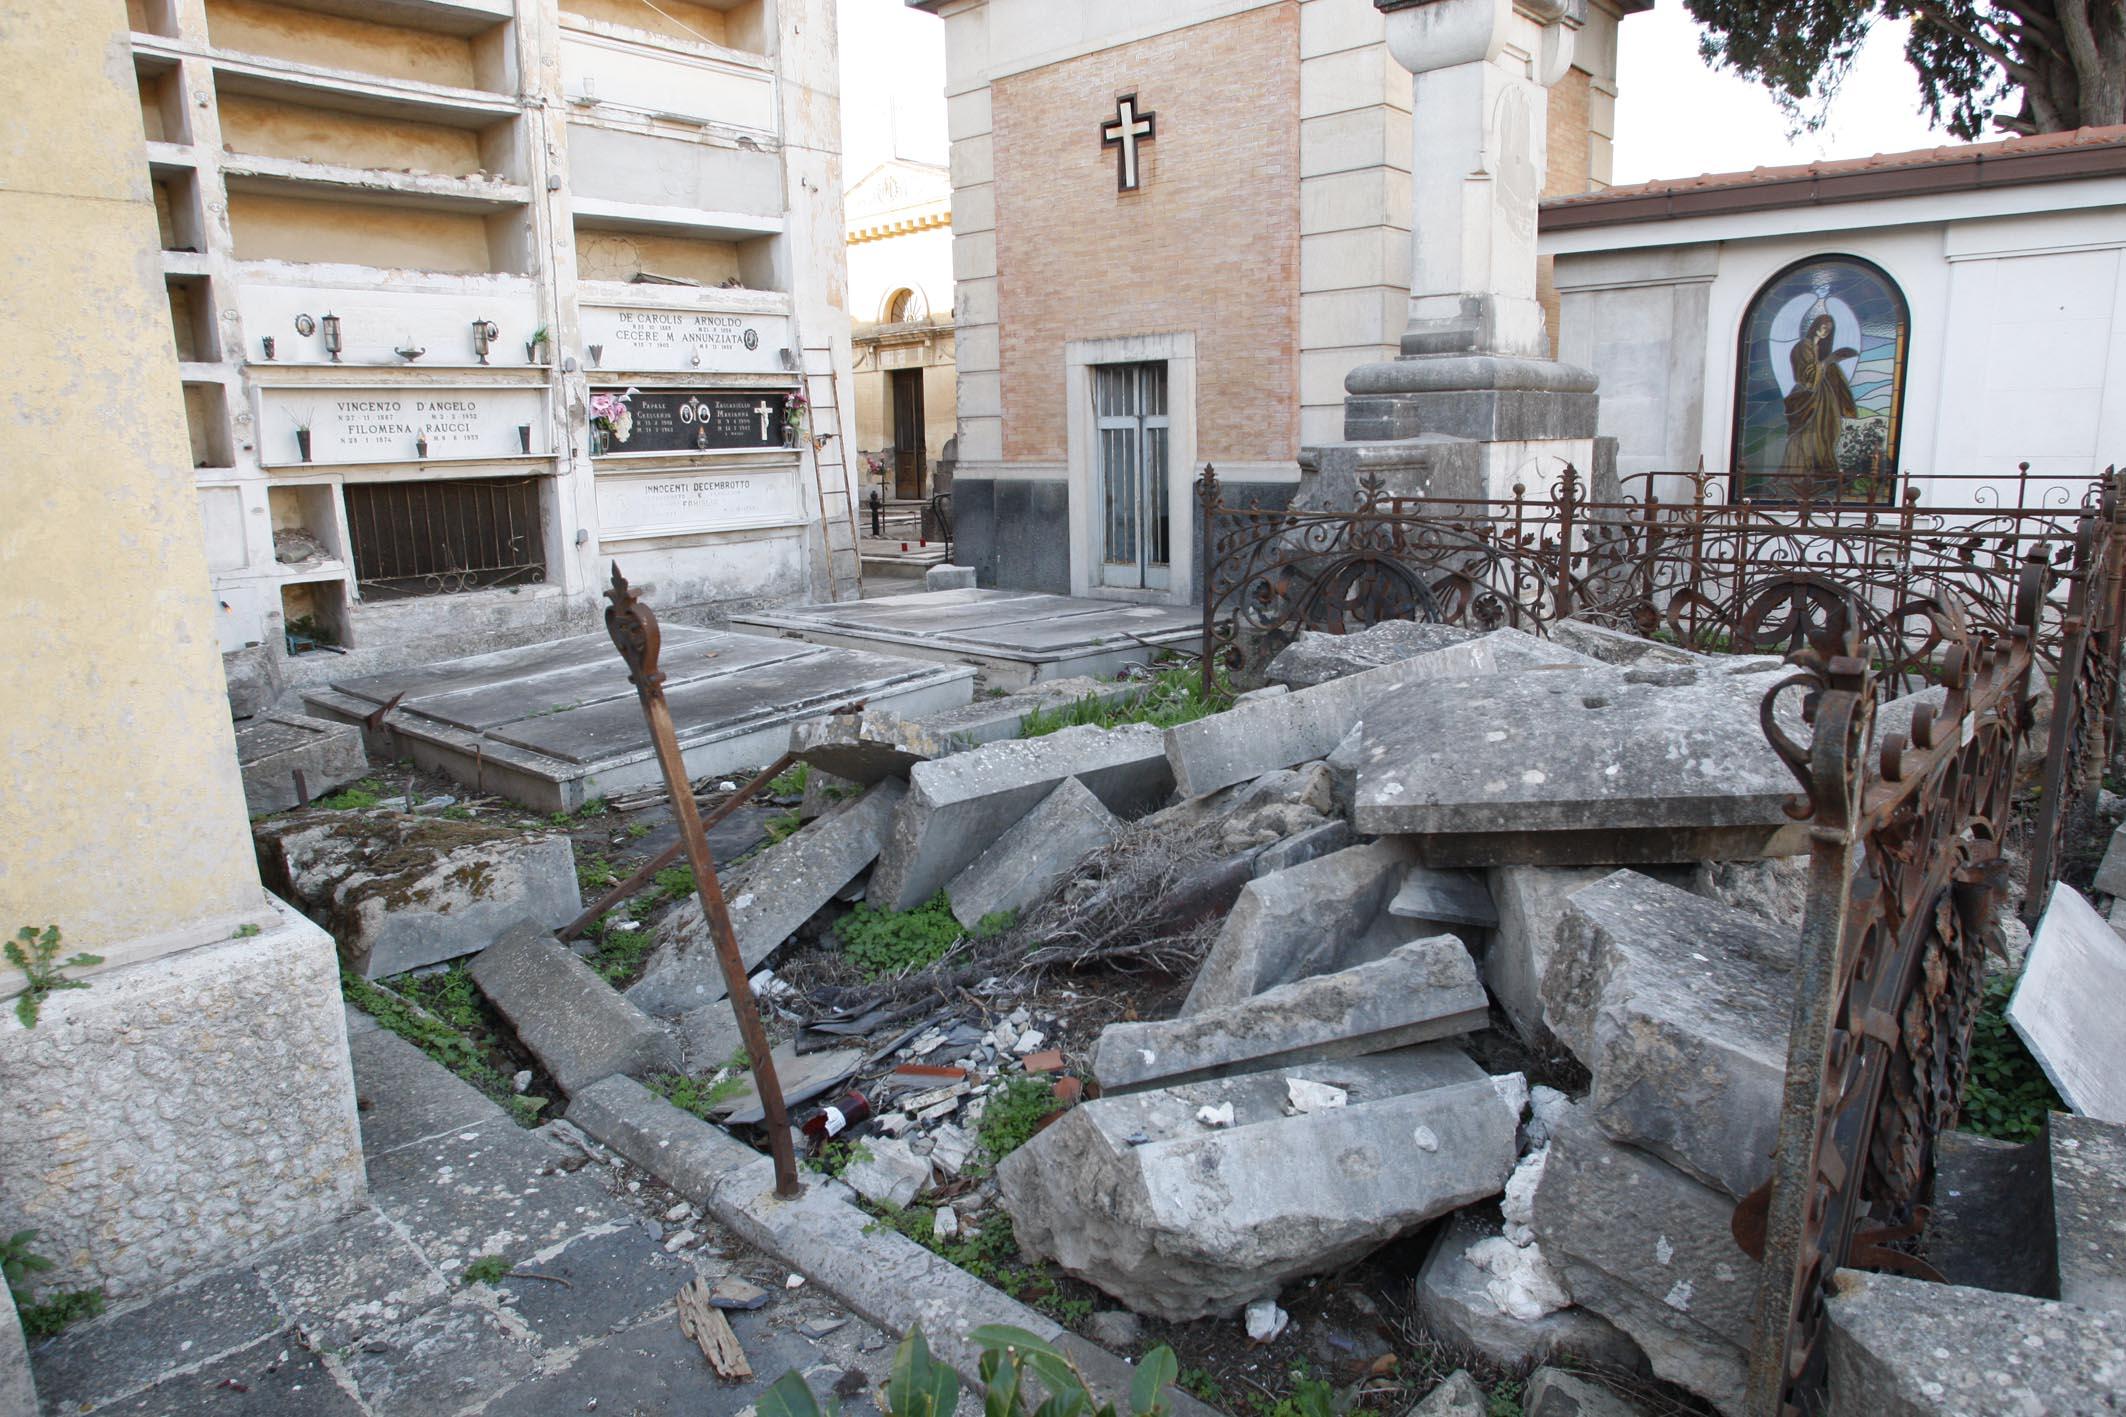 Santa Maria Capua Vetere – Cimitero Vecchio: leggasi degrado e decadenza